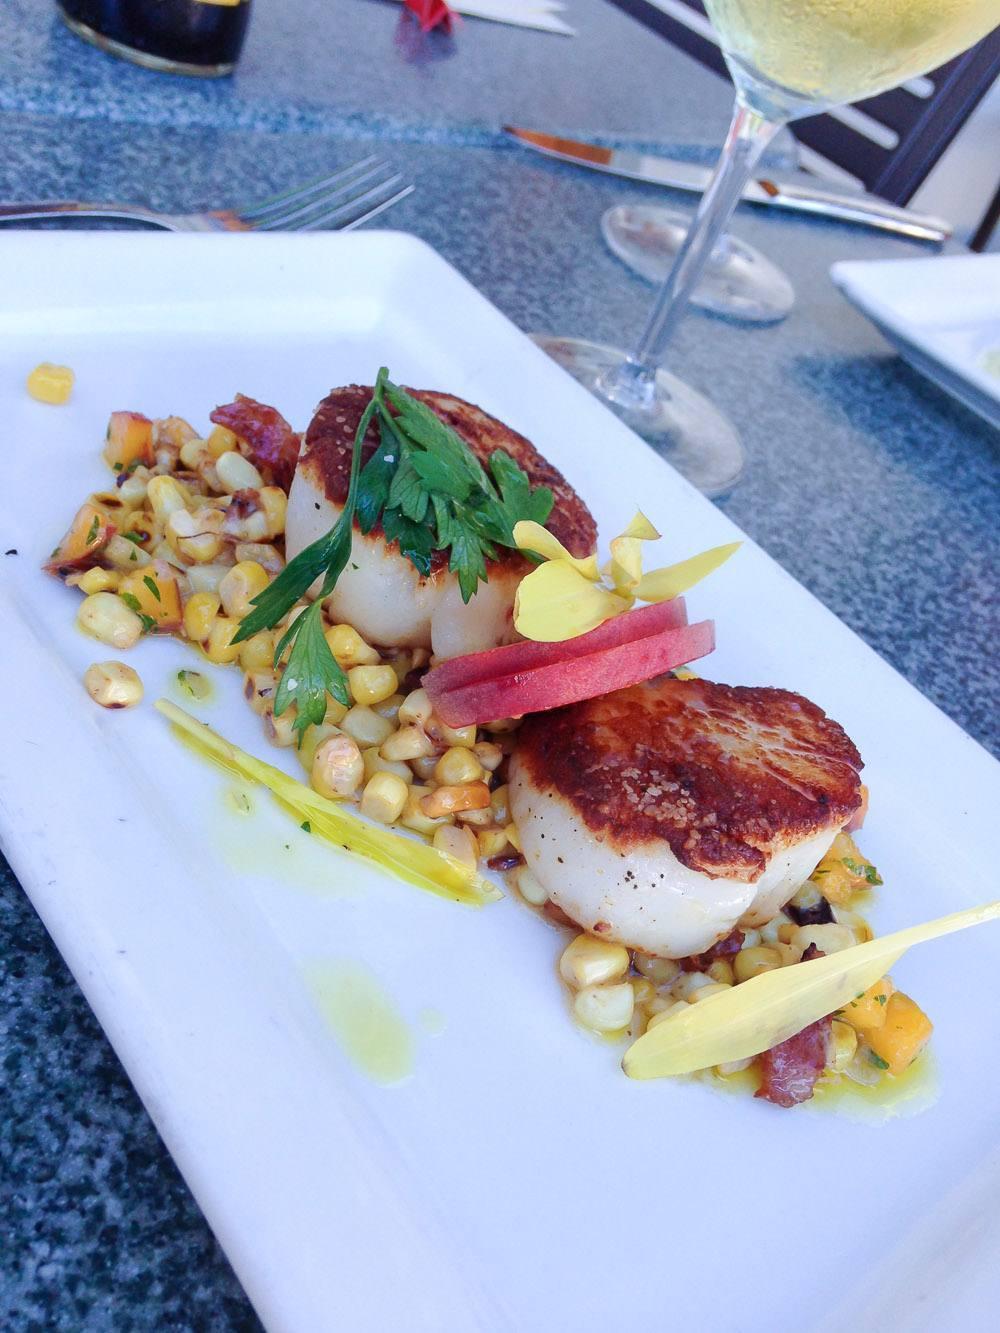 The Fishery Restaurant's Seared Scallops